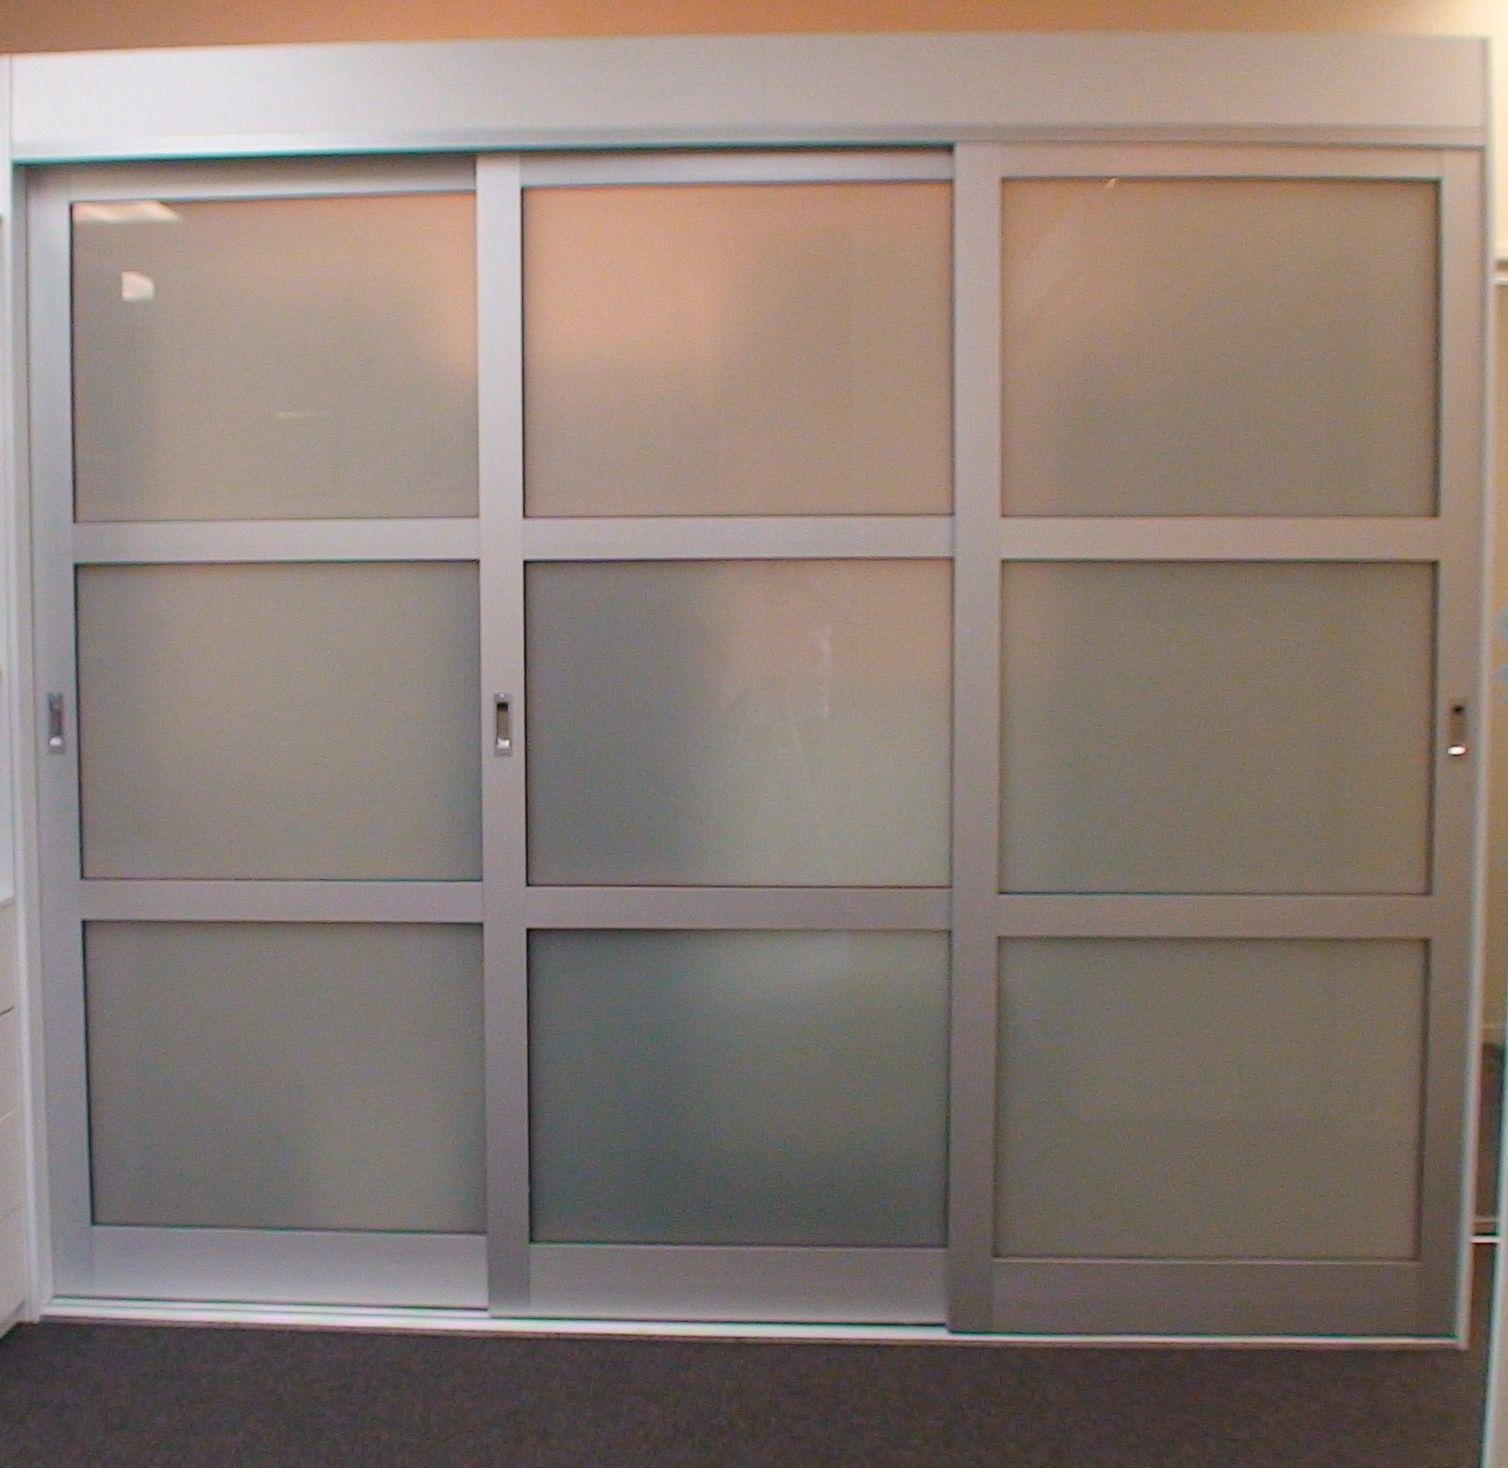 Furniture White Glass Sliding Doors With Black Wooden Frame On